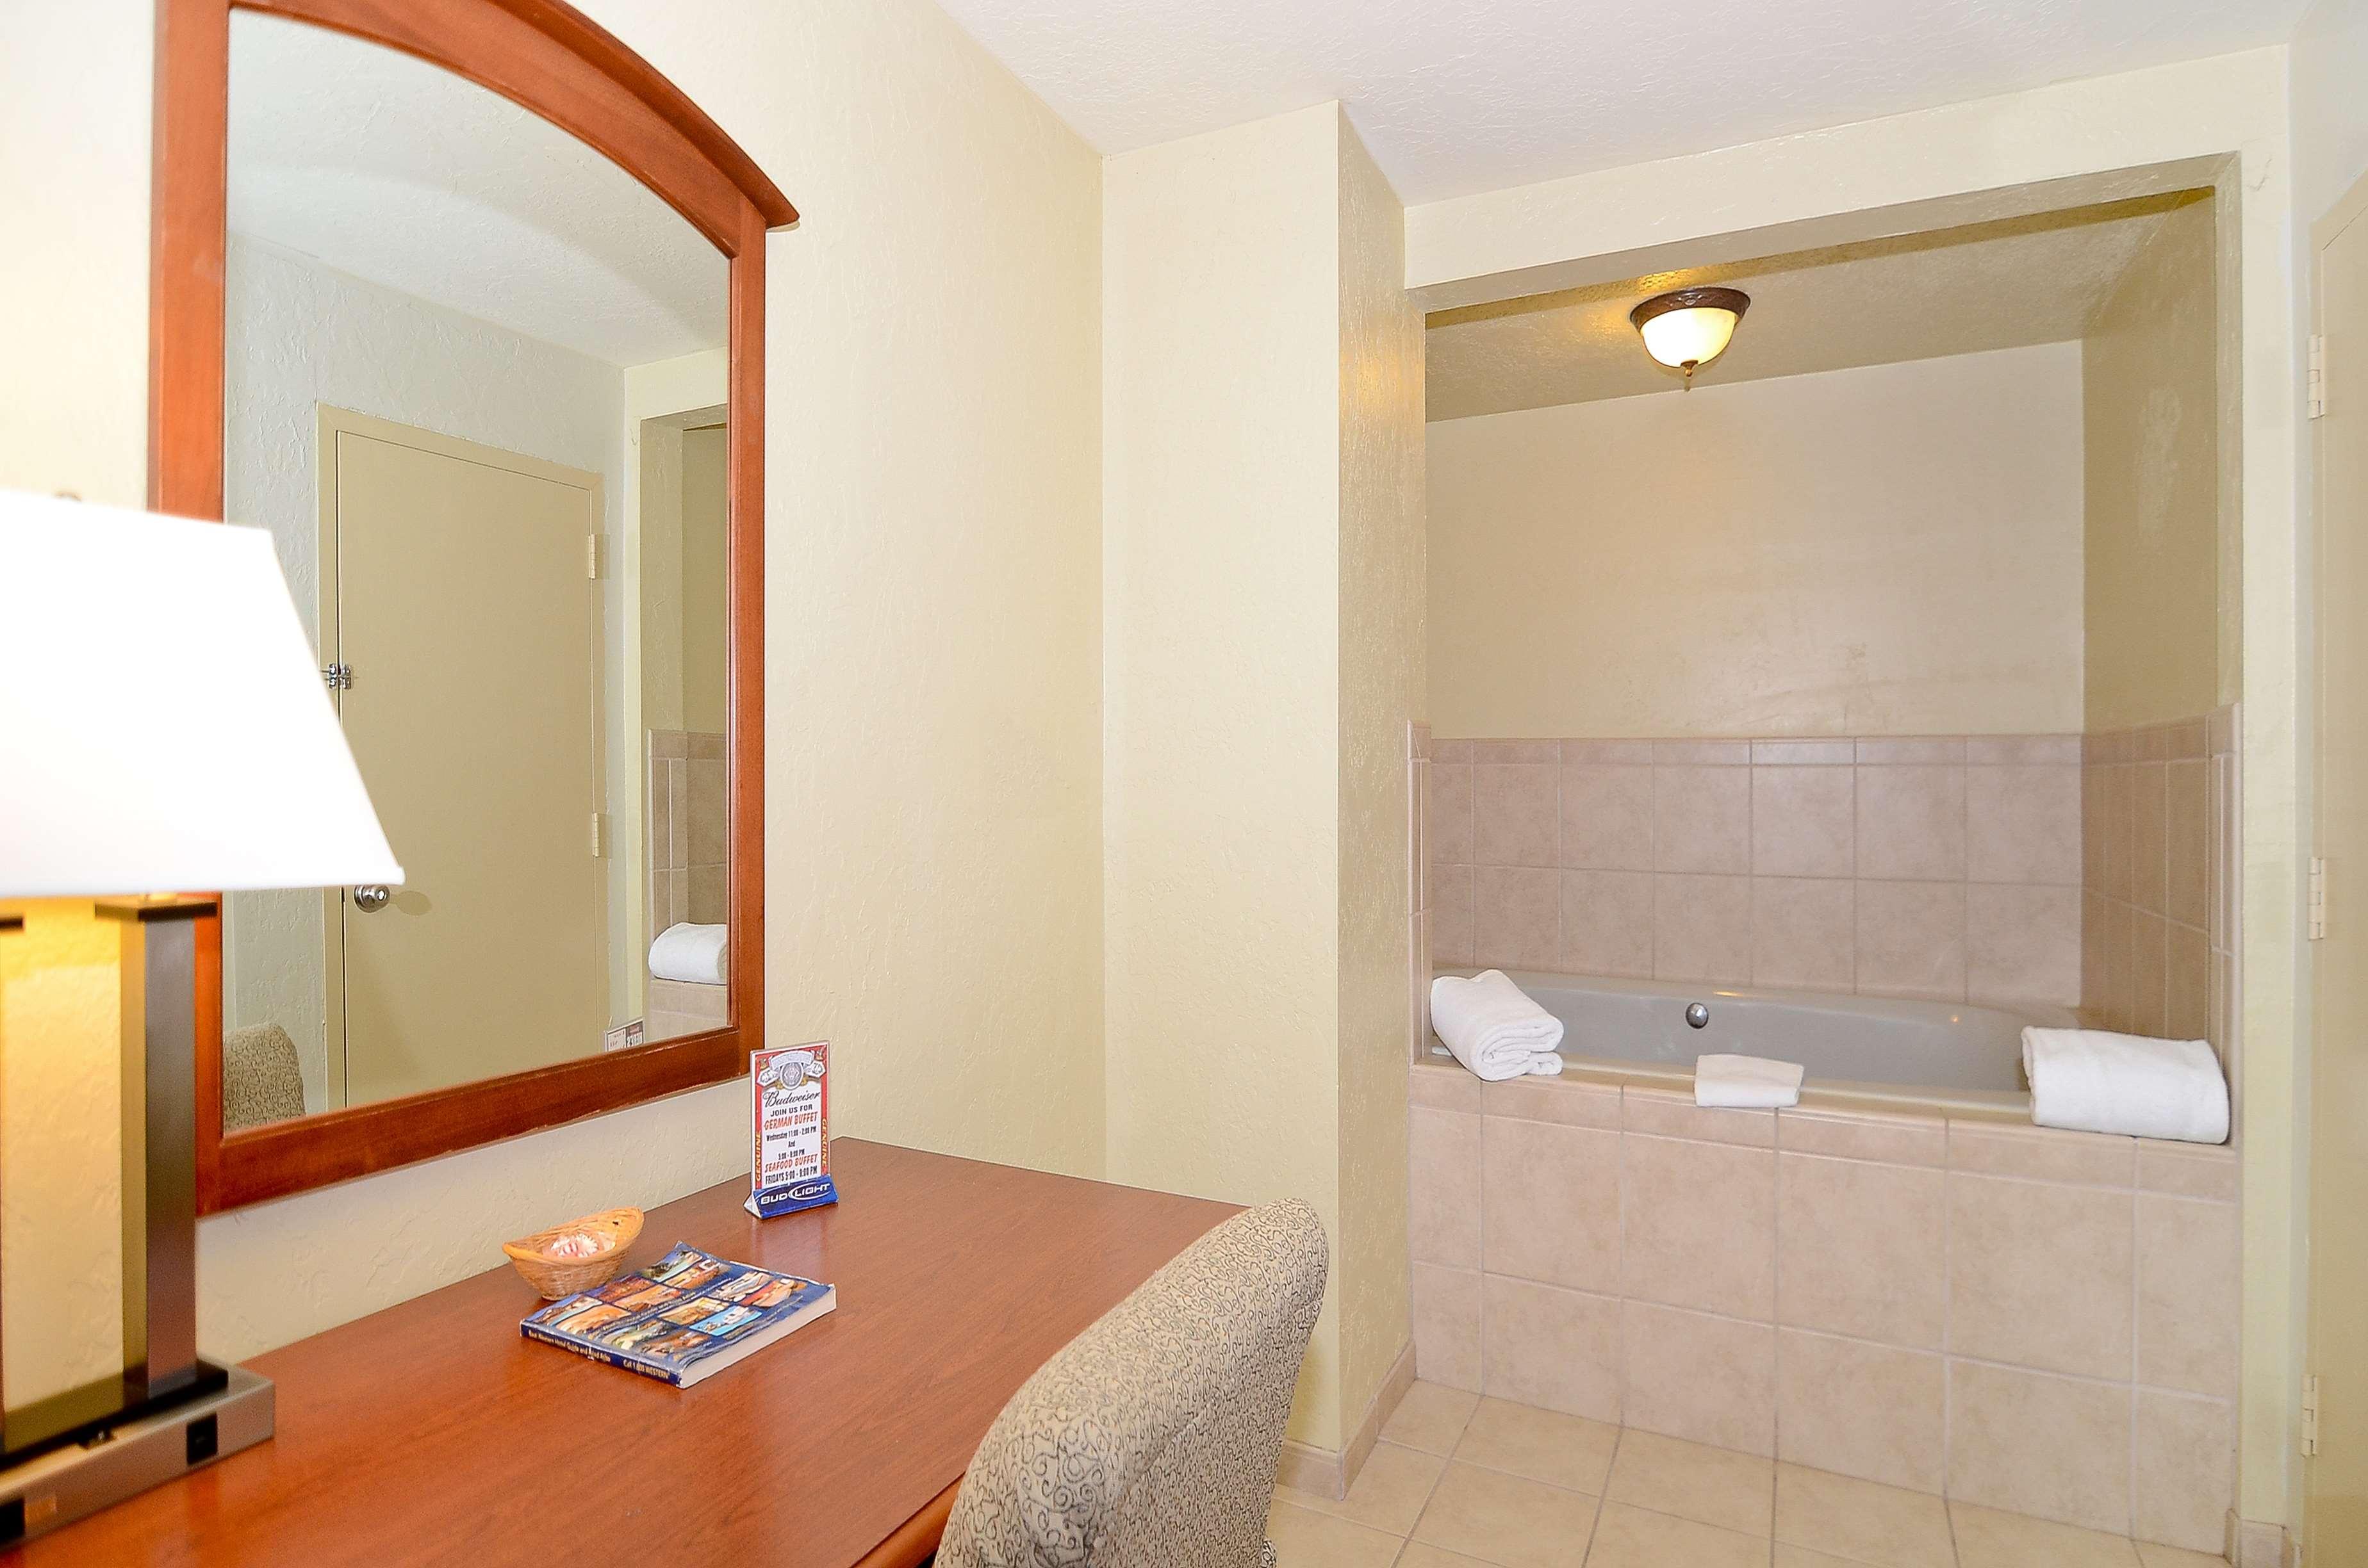 Best Western Plus Lawton Hotel & Convention Center image 17